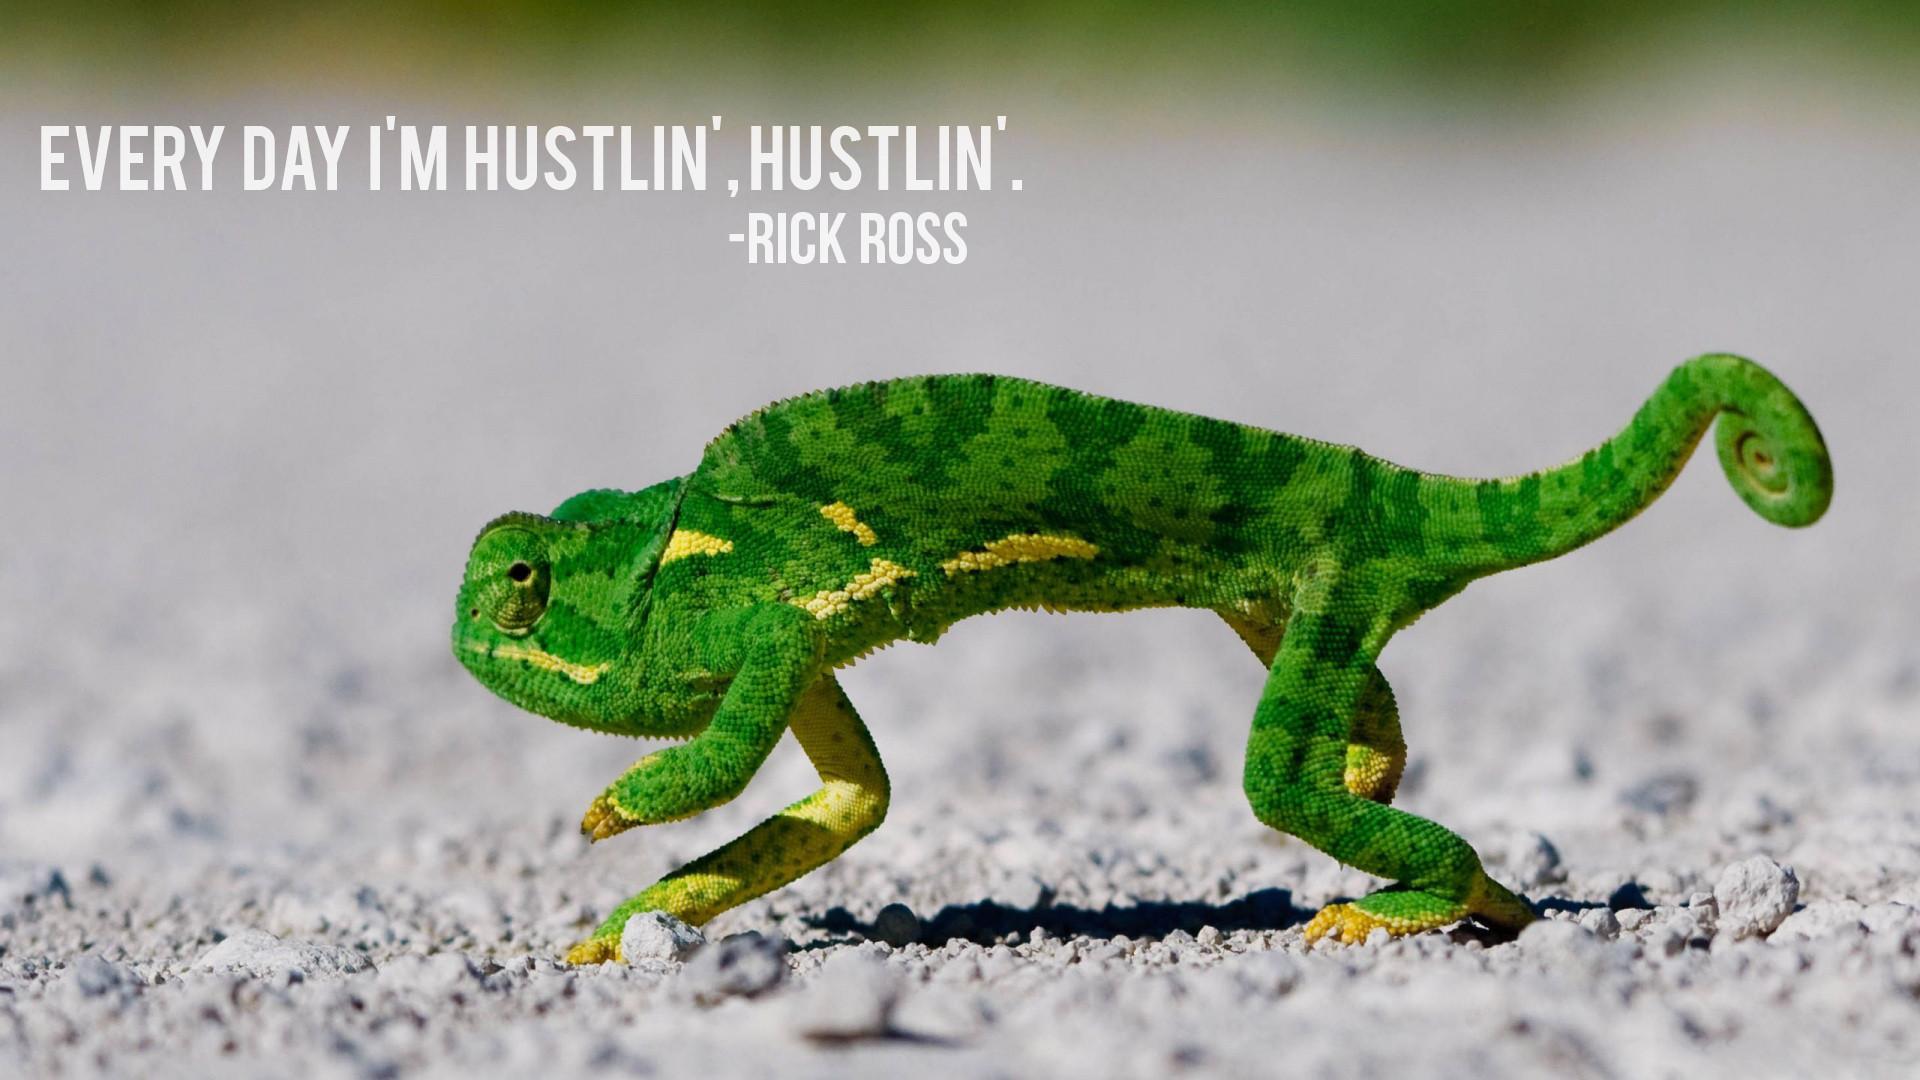 Hustlin Chameleon Lizard rap hip hop humor funny wallpaper ...